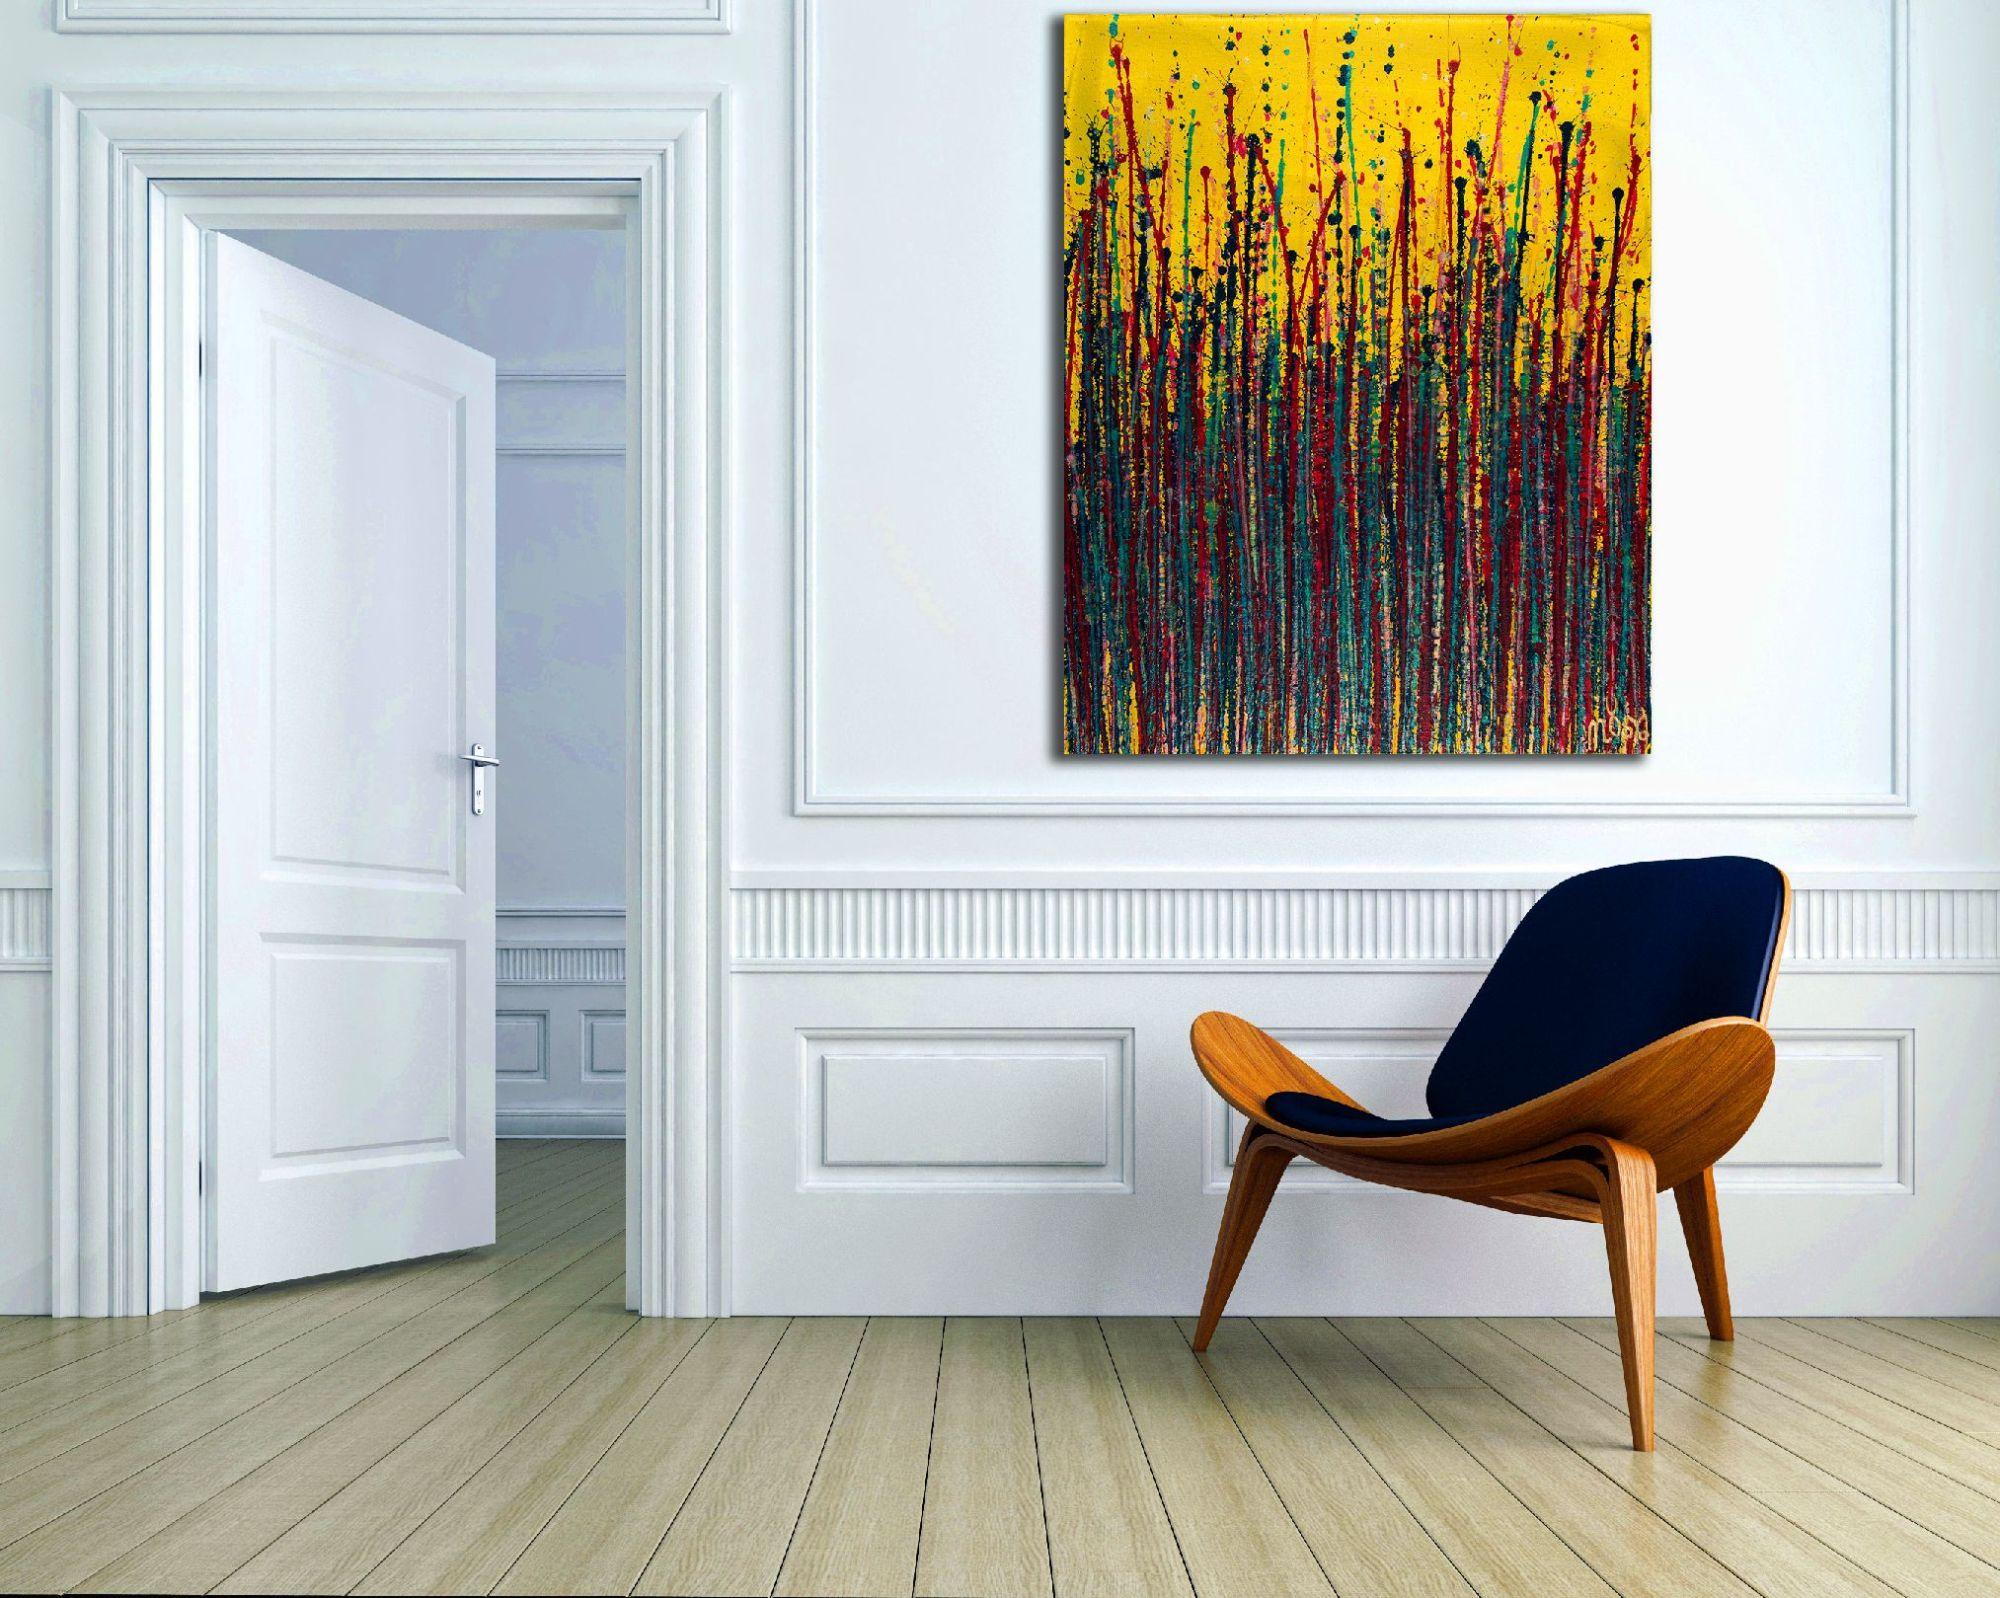 Room View - Garden In Motion 5 (2020) by Nestor Toro